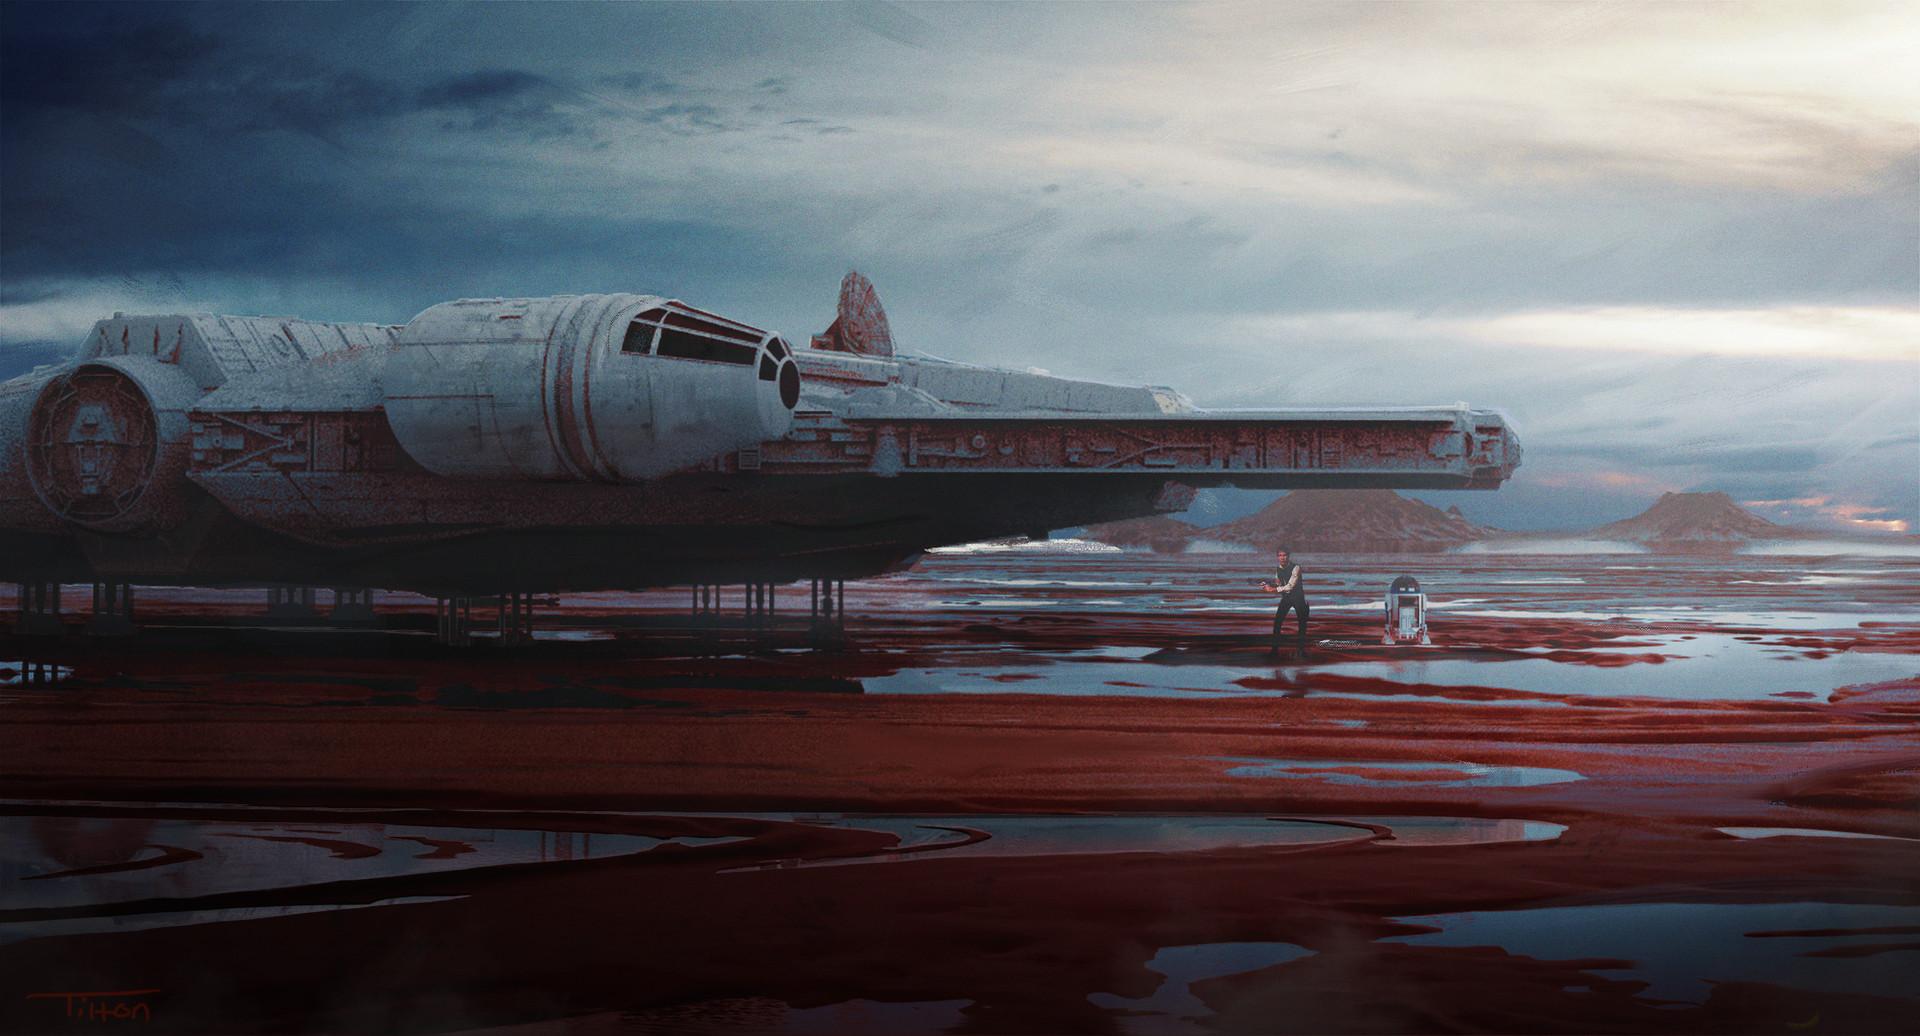 The Science Fiction Artworks of David Tilton